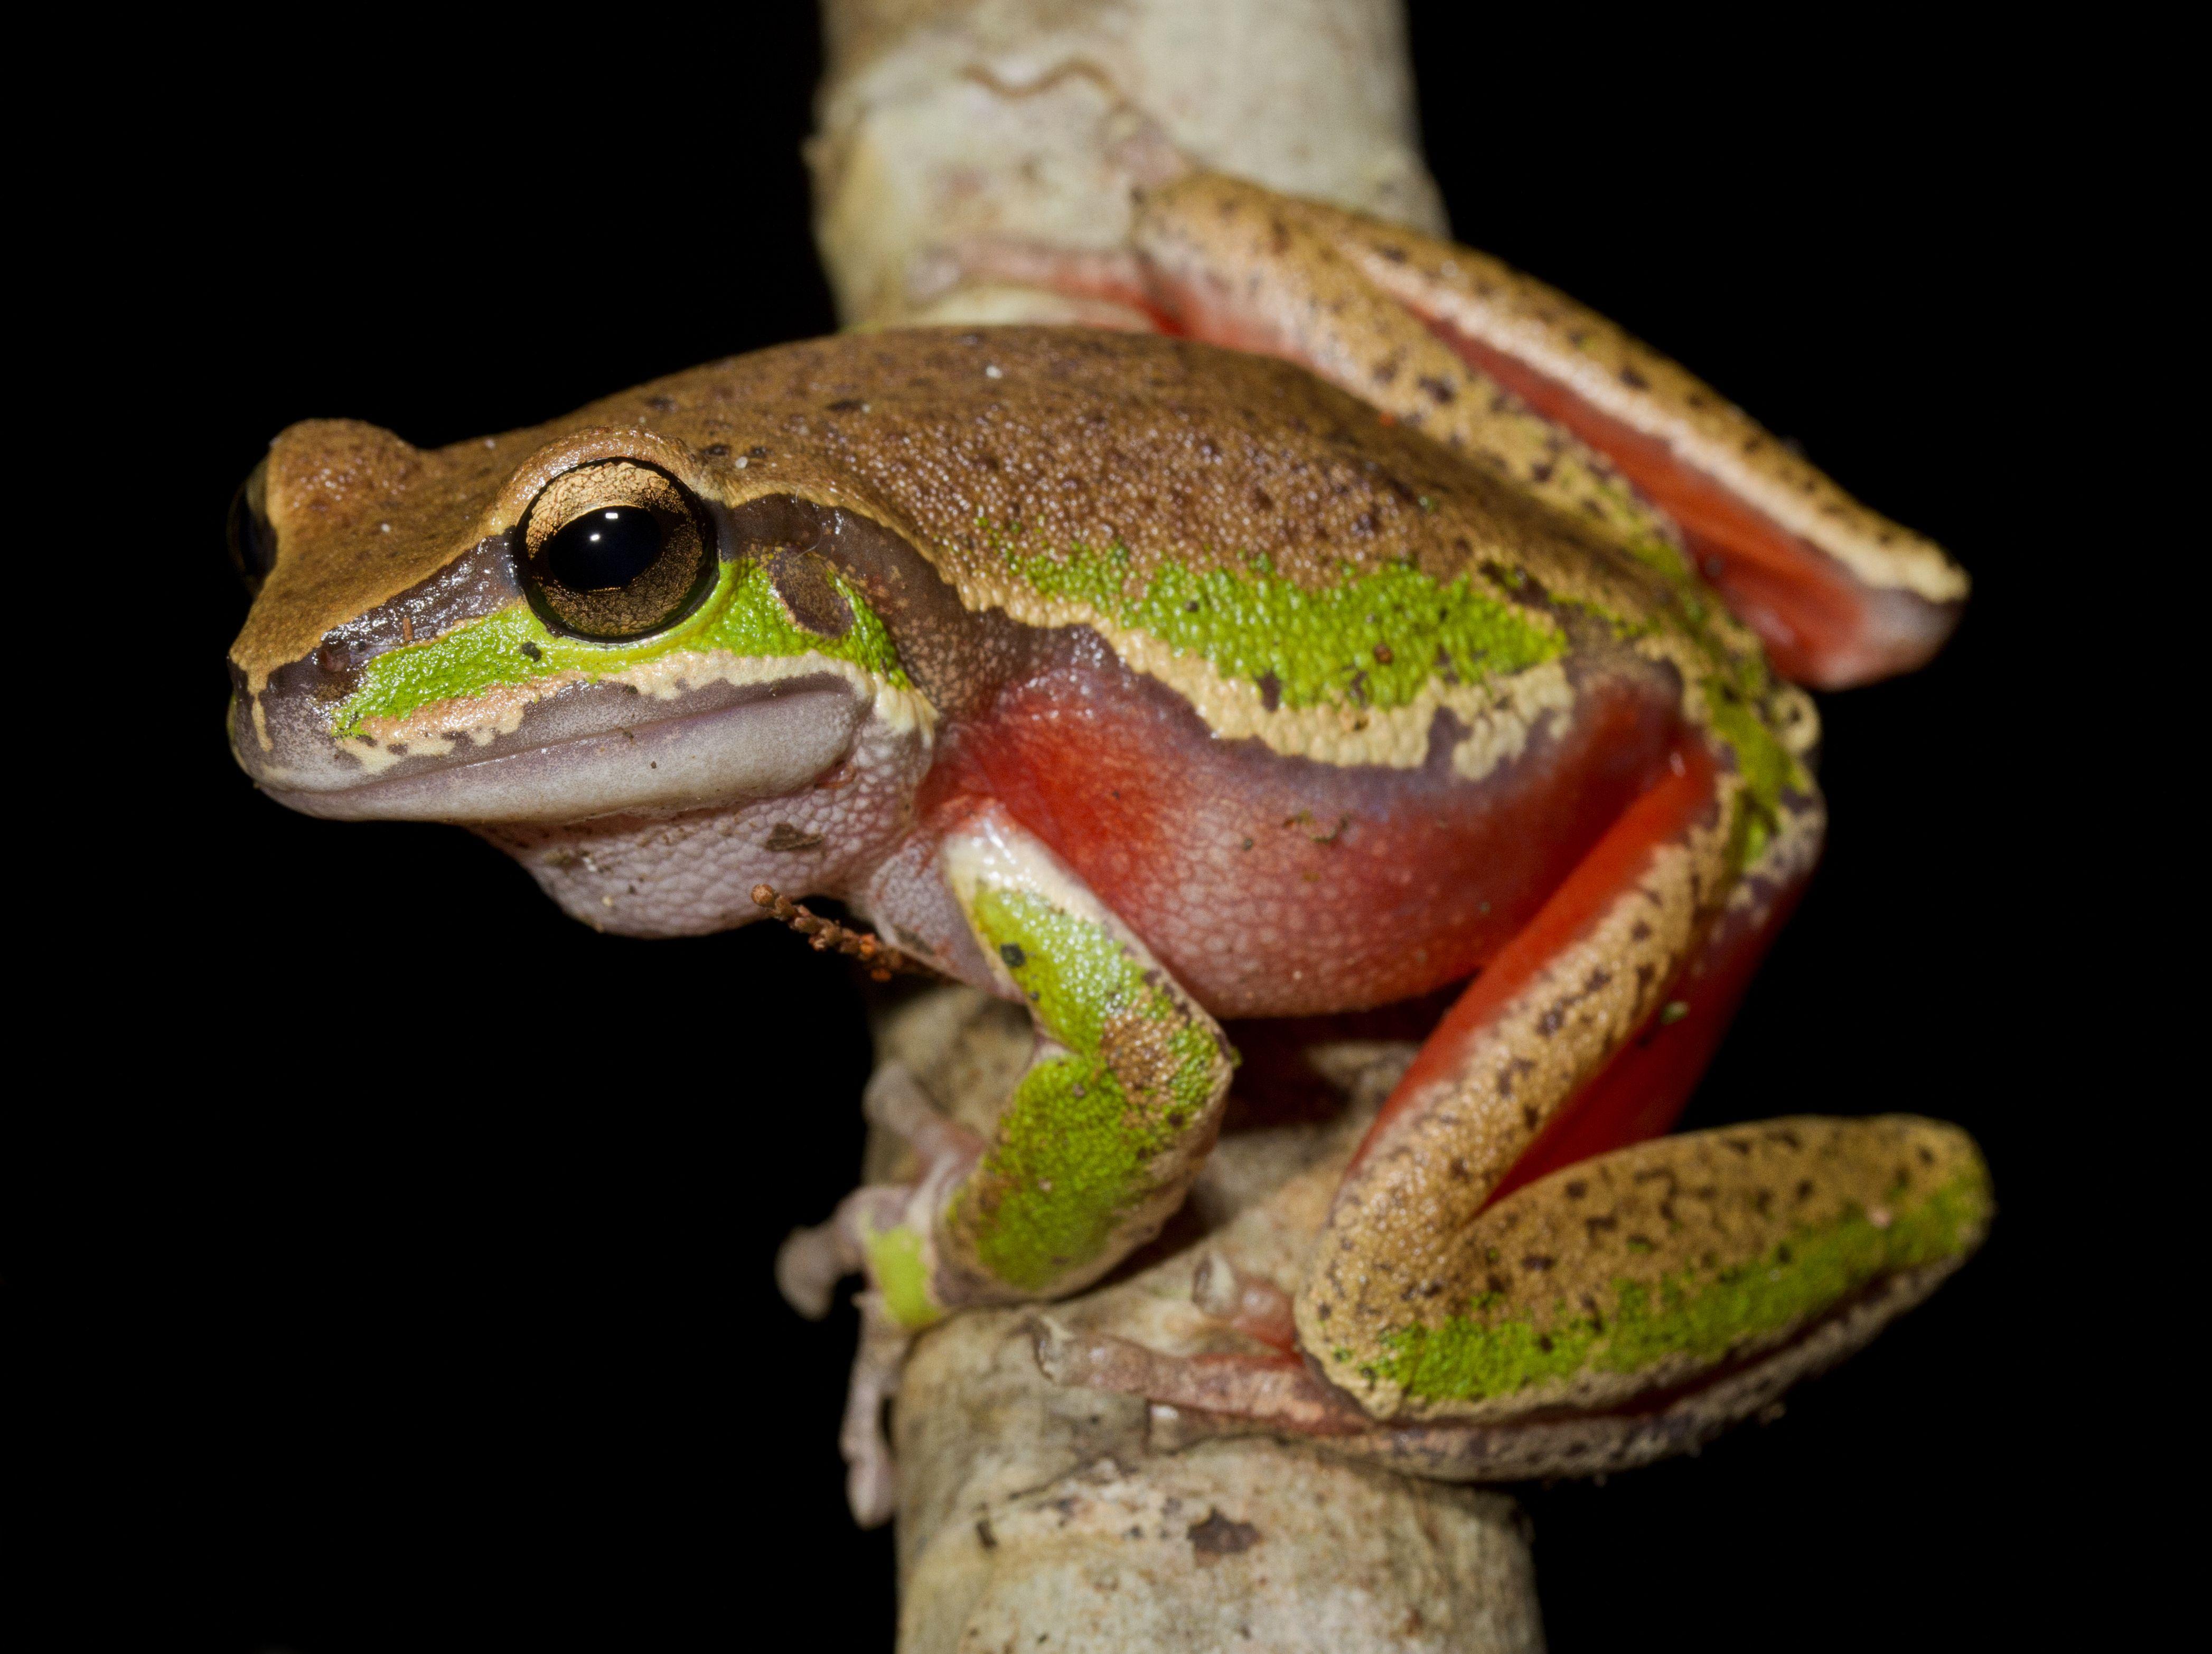 Blue Mountains tree frog (Litoria citropa) [4188 x 3132] [OC] - http://ift.tt/2bQ8NCP